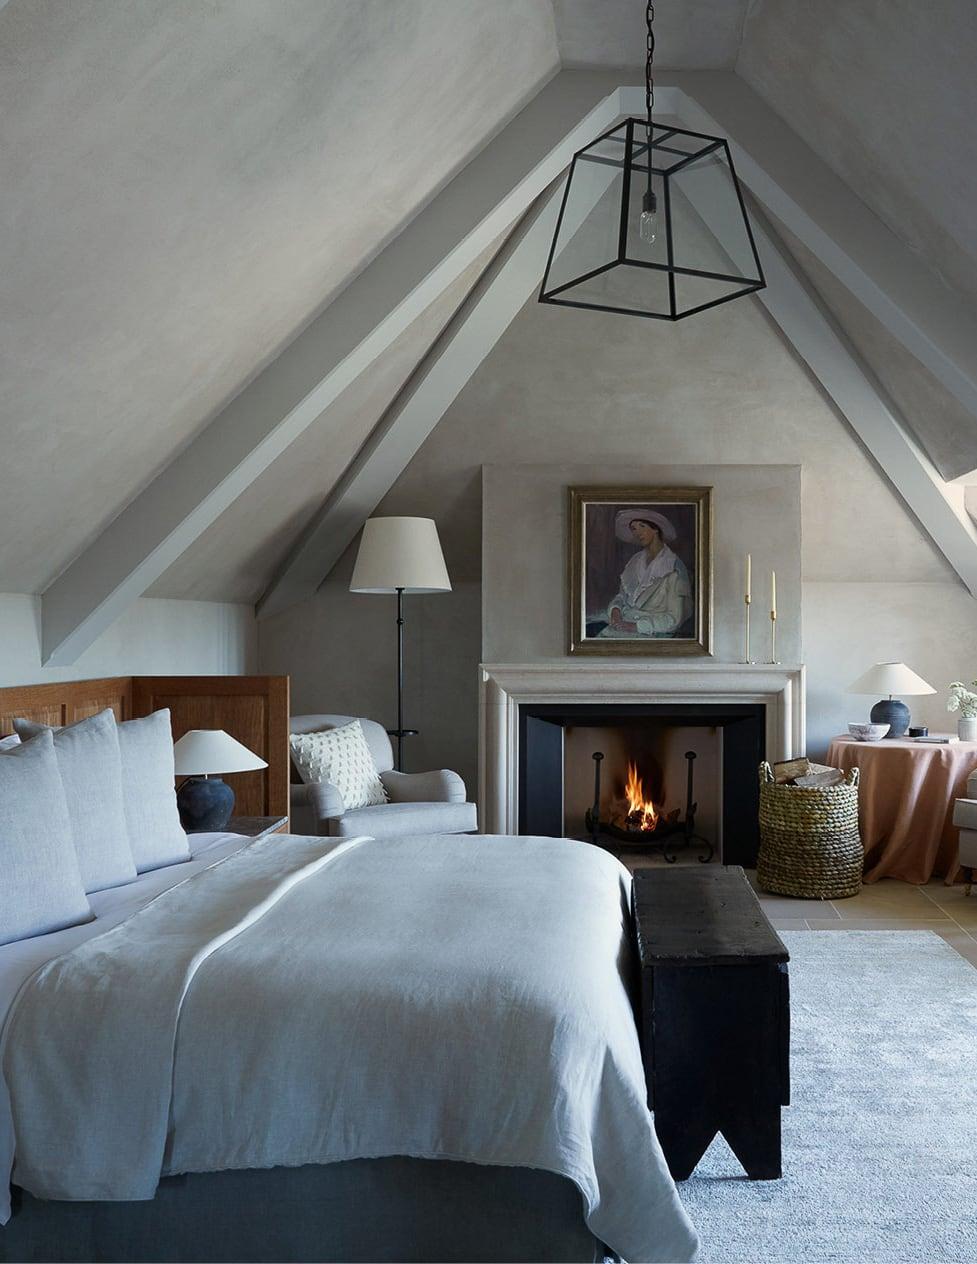 georgian style interior bedroom